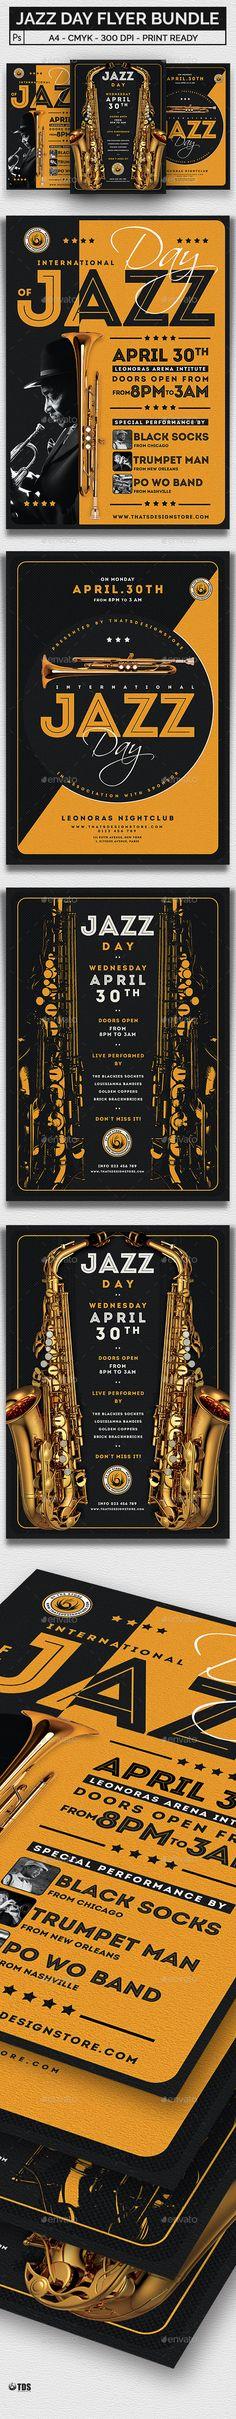 Jazz Day #Flyer Bundle - Concerts Events